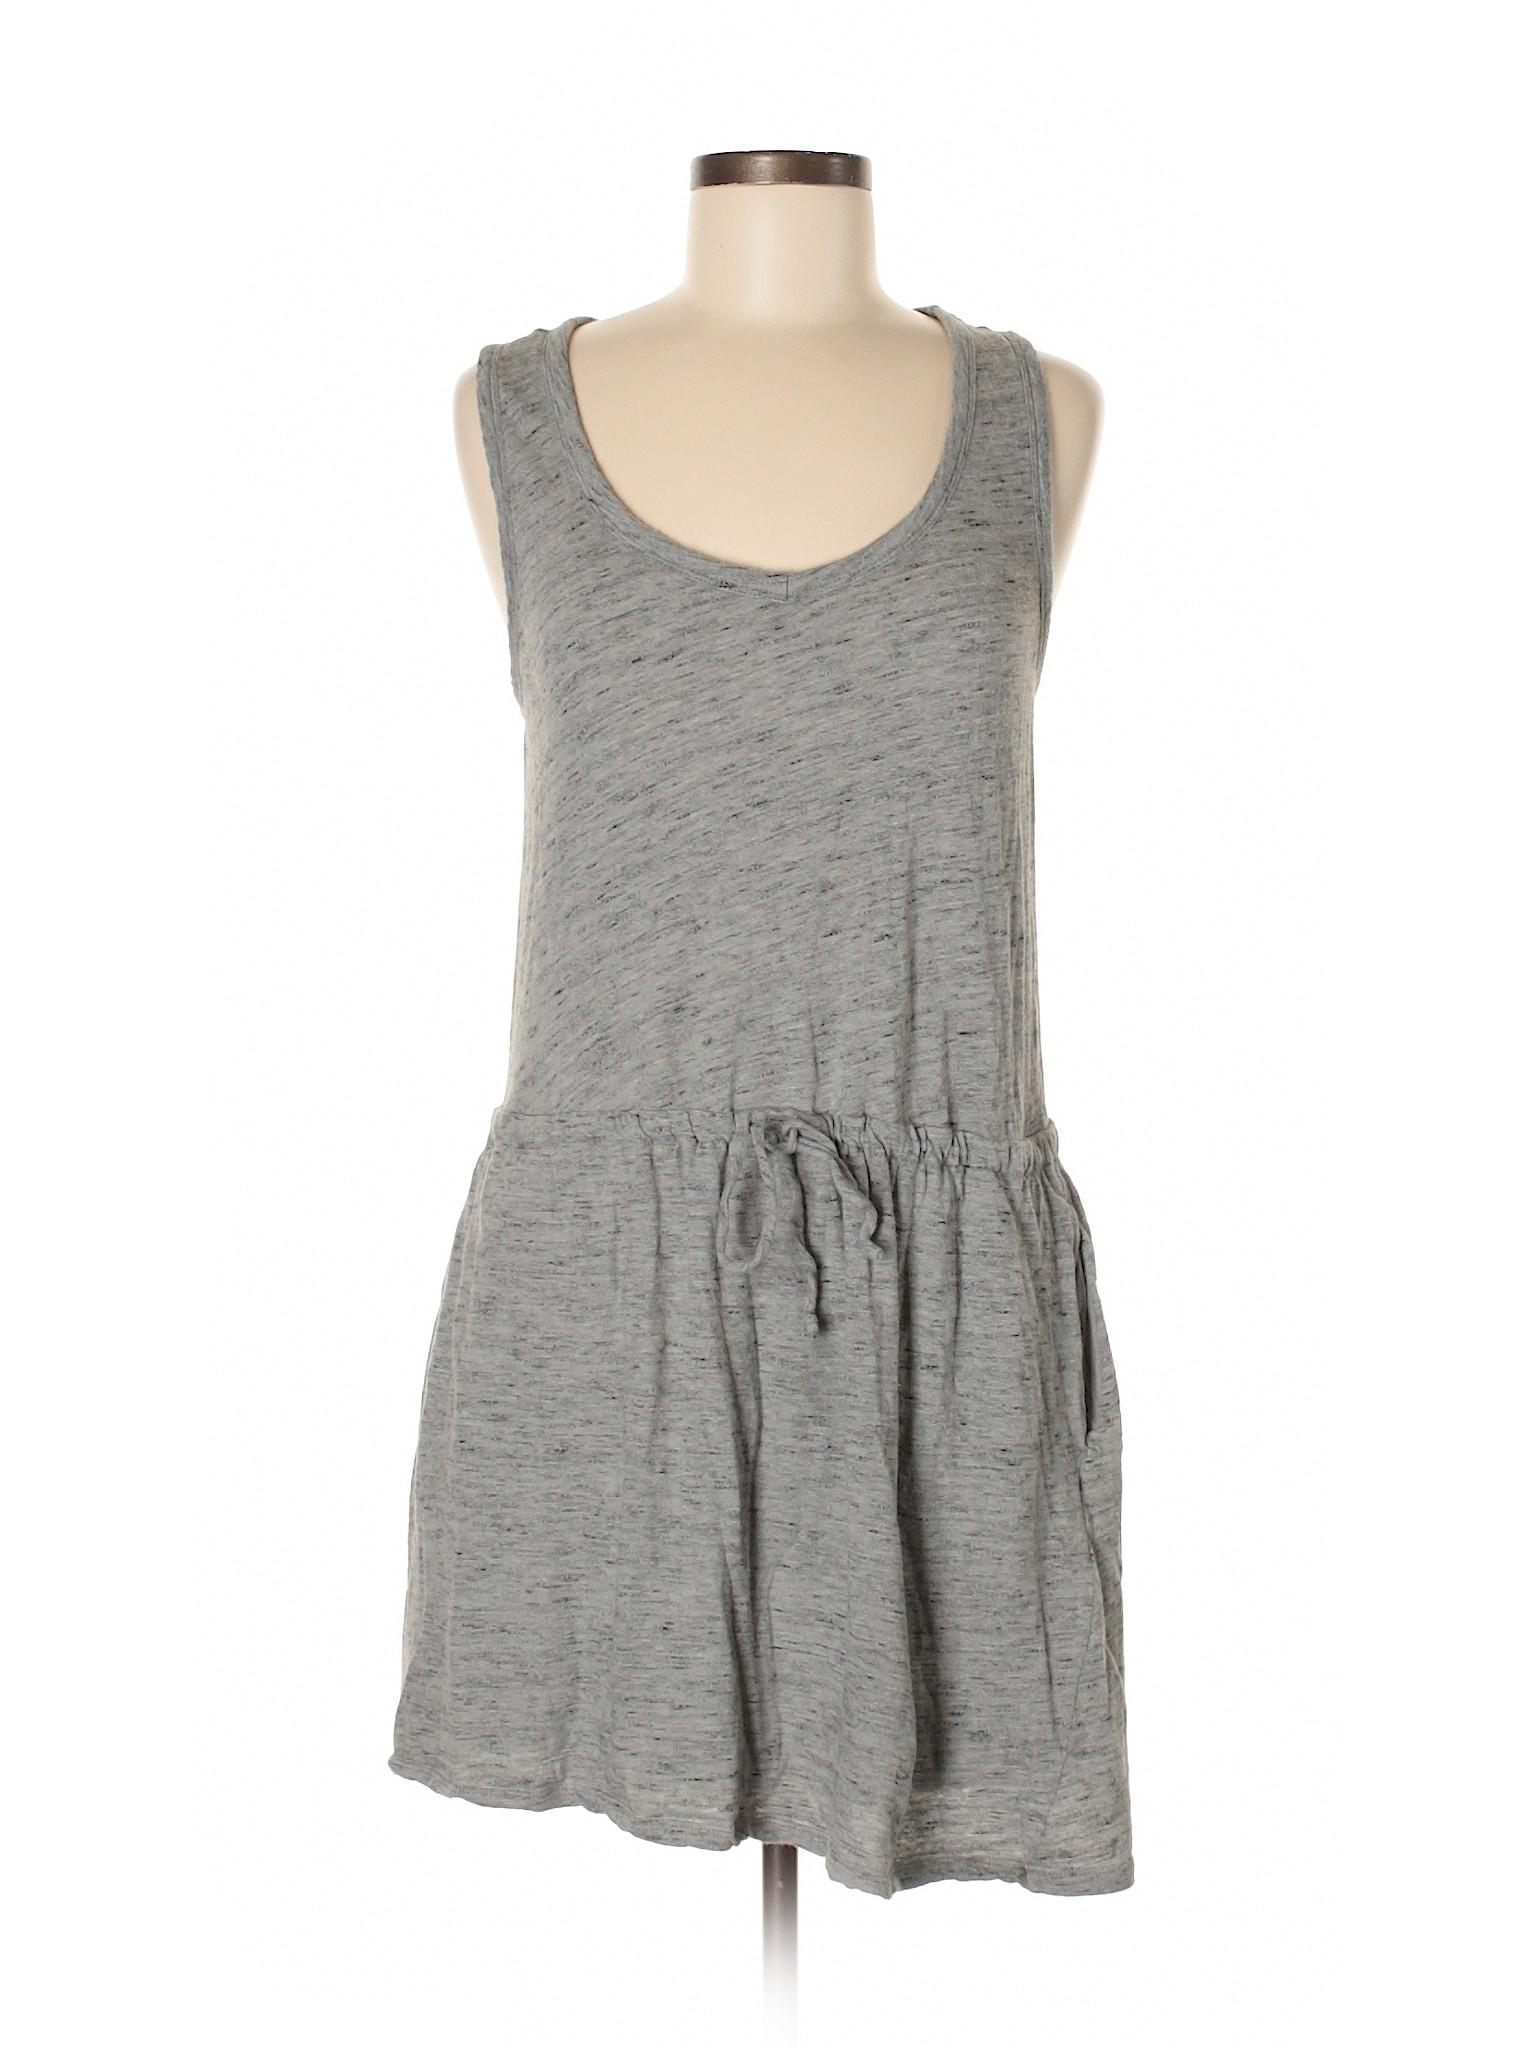 Gap Casual Boutique Gap Dress winter Dress Boutique Boutique winter Casual Xqx5450vwK